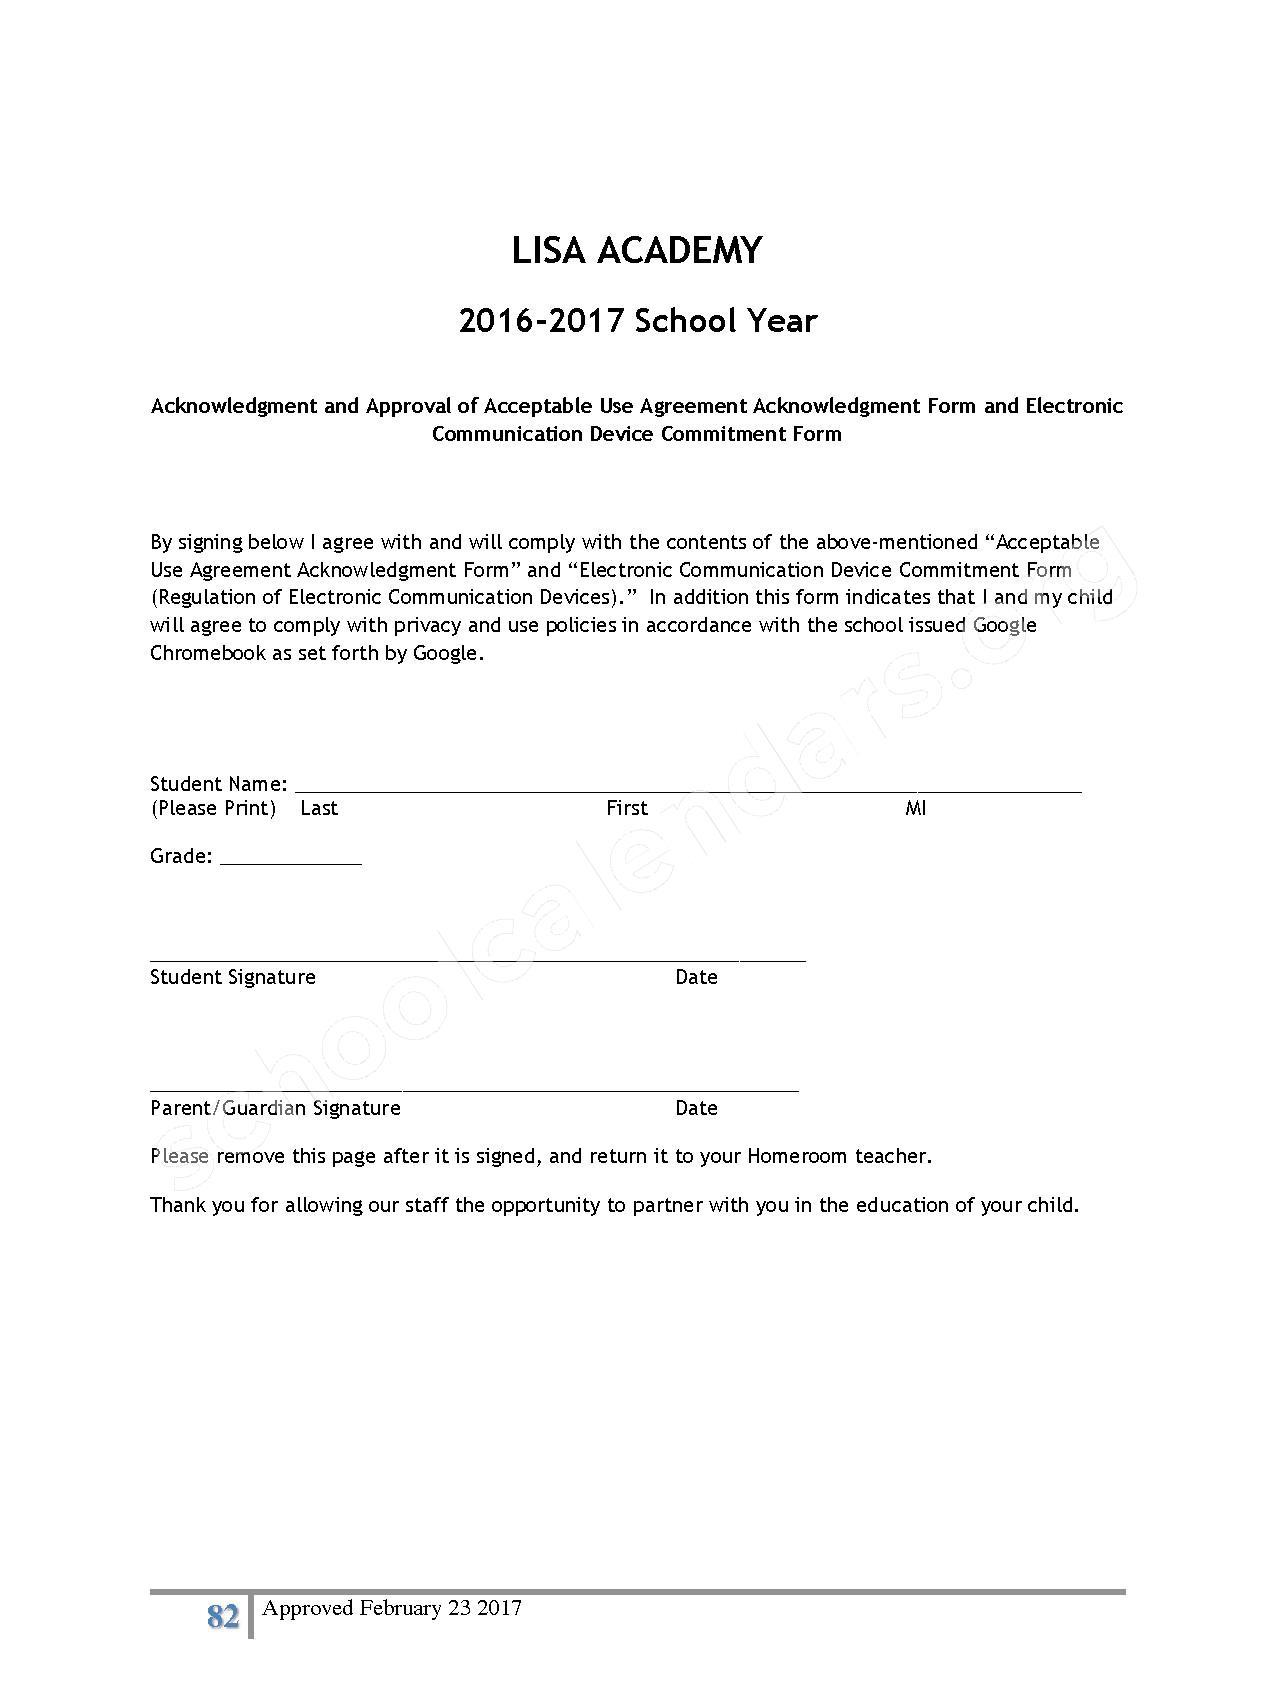 2016 - 2017 District Calendar – Lisa Academy Public Charter Schools – page 82